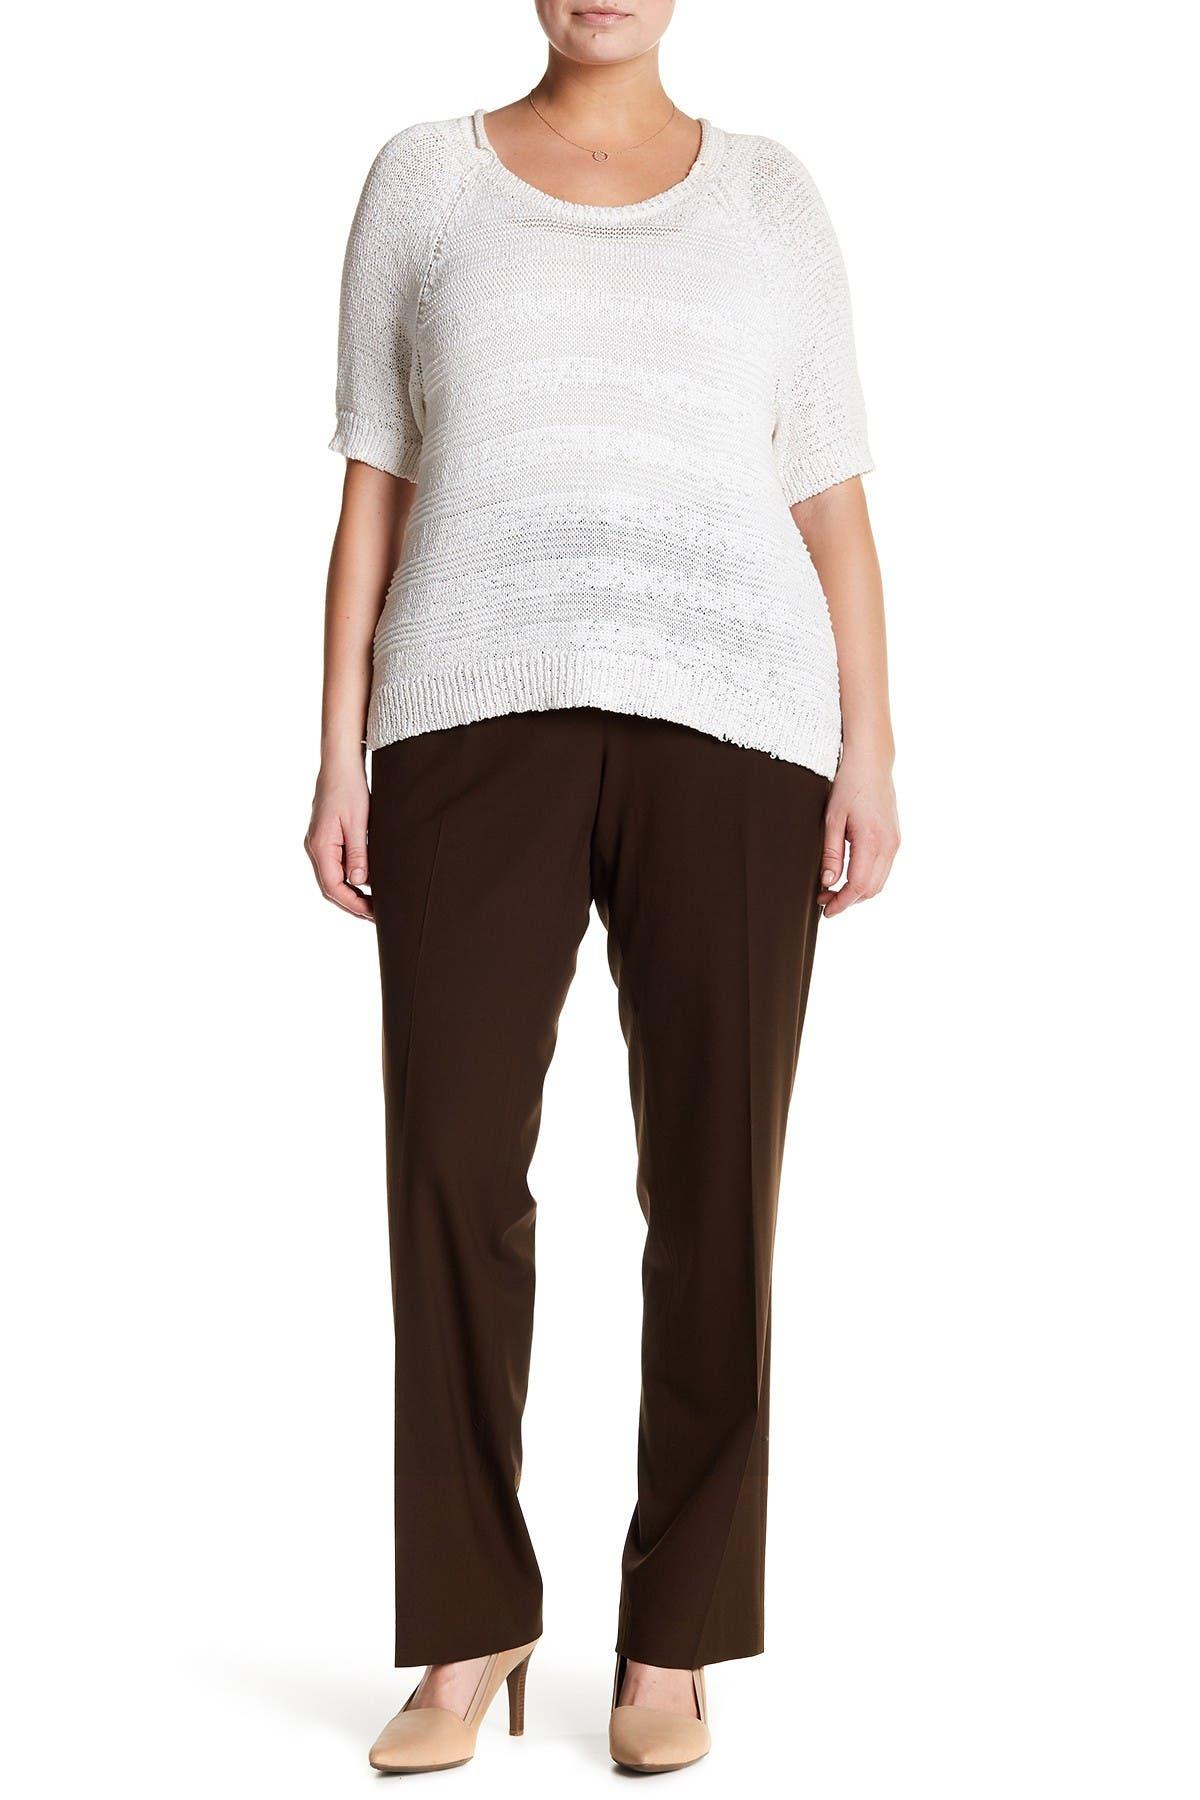 Image of Lafayette 148 New York Wool Blend Straight Leg Pants